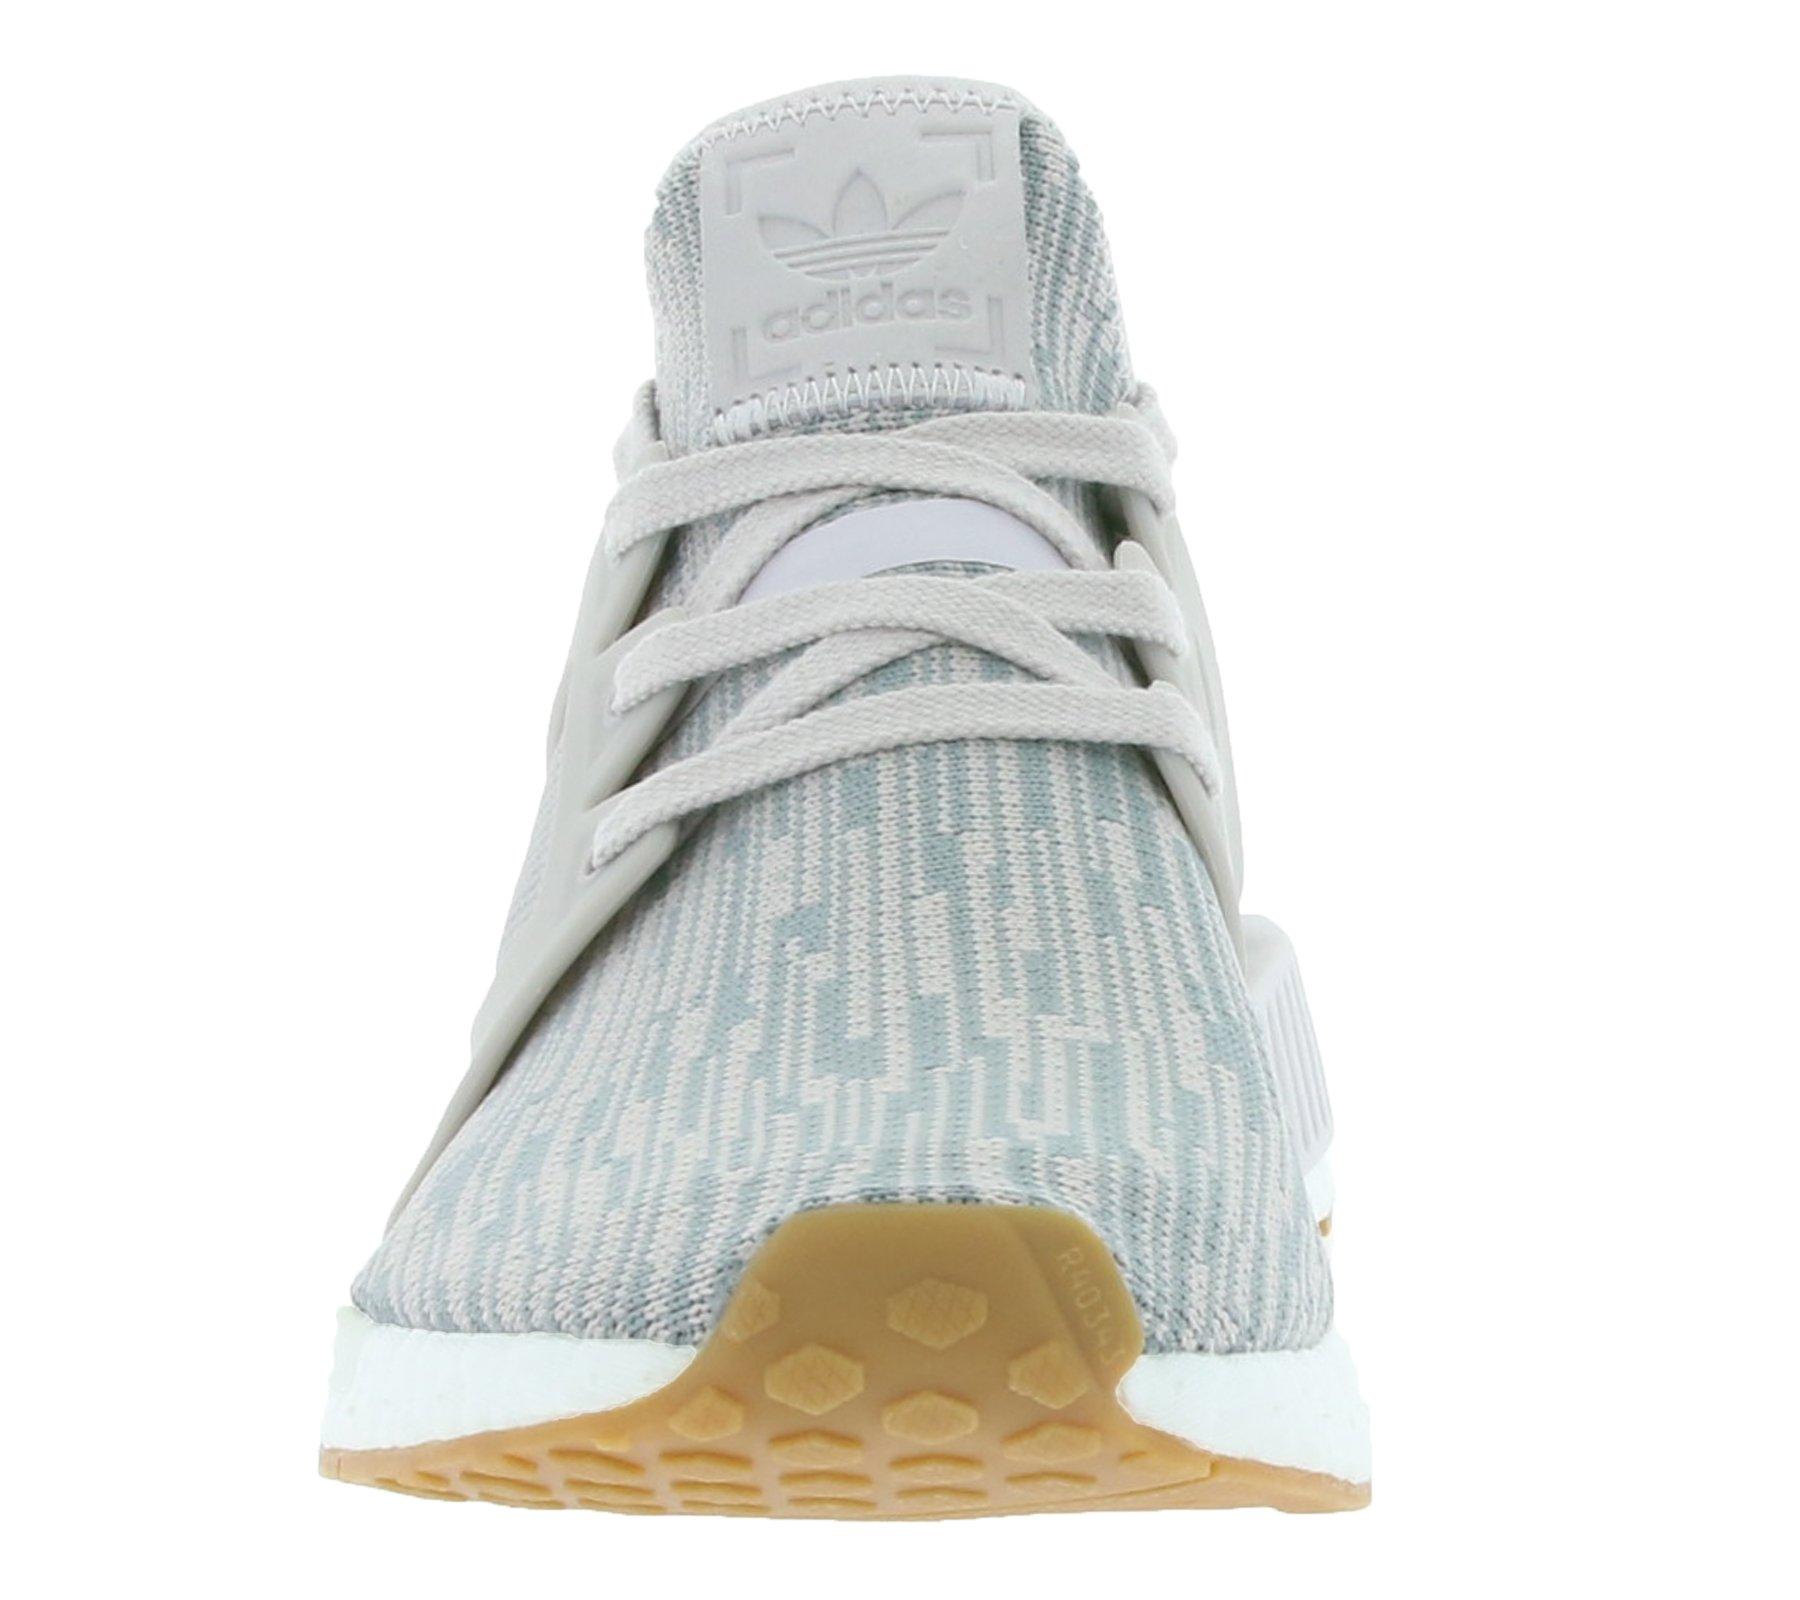 Damen Sneakers Sand 382 21 adidas Originals Primeknit 3 XR1 NMD q5xE4p